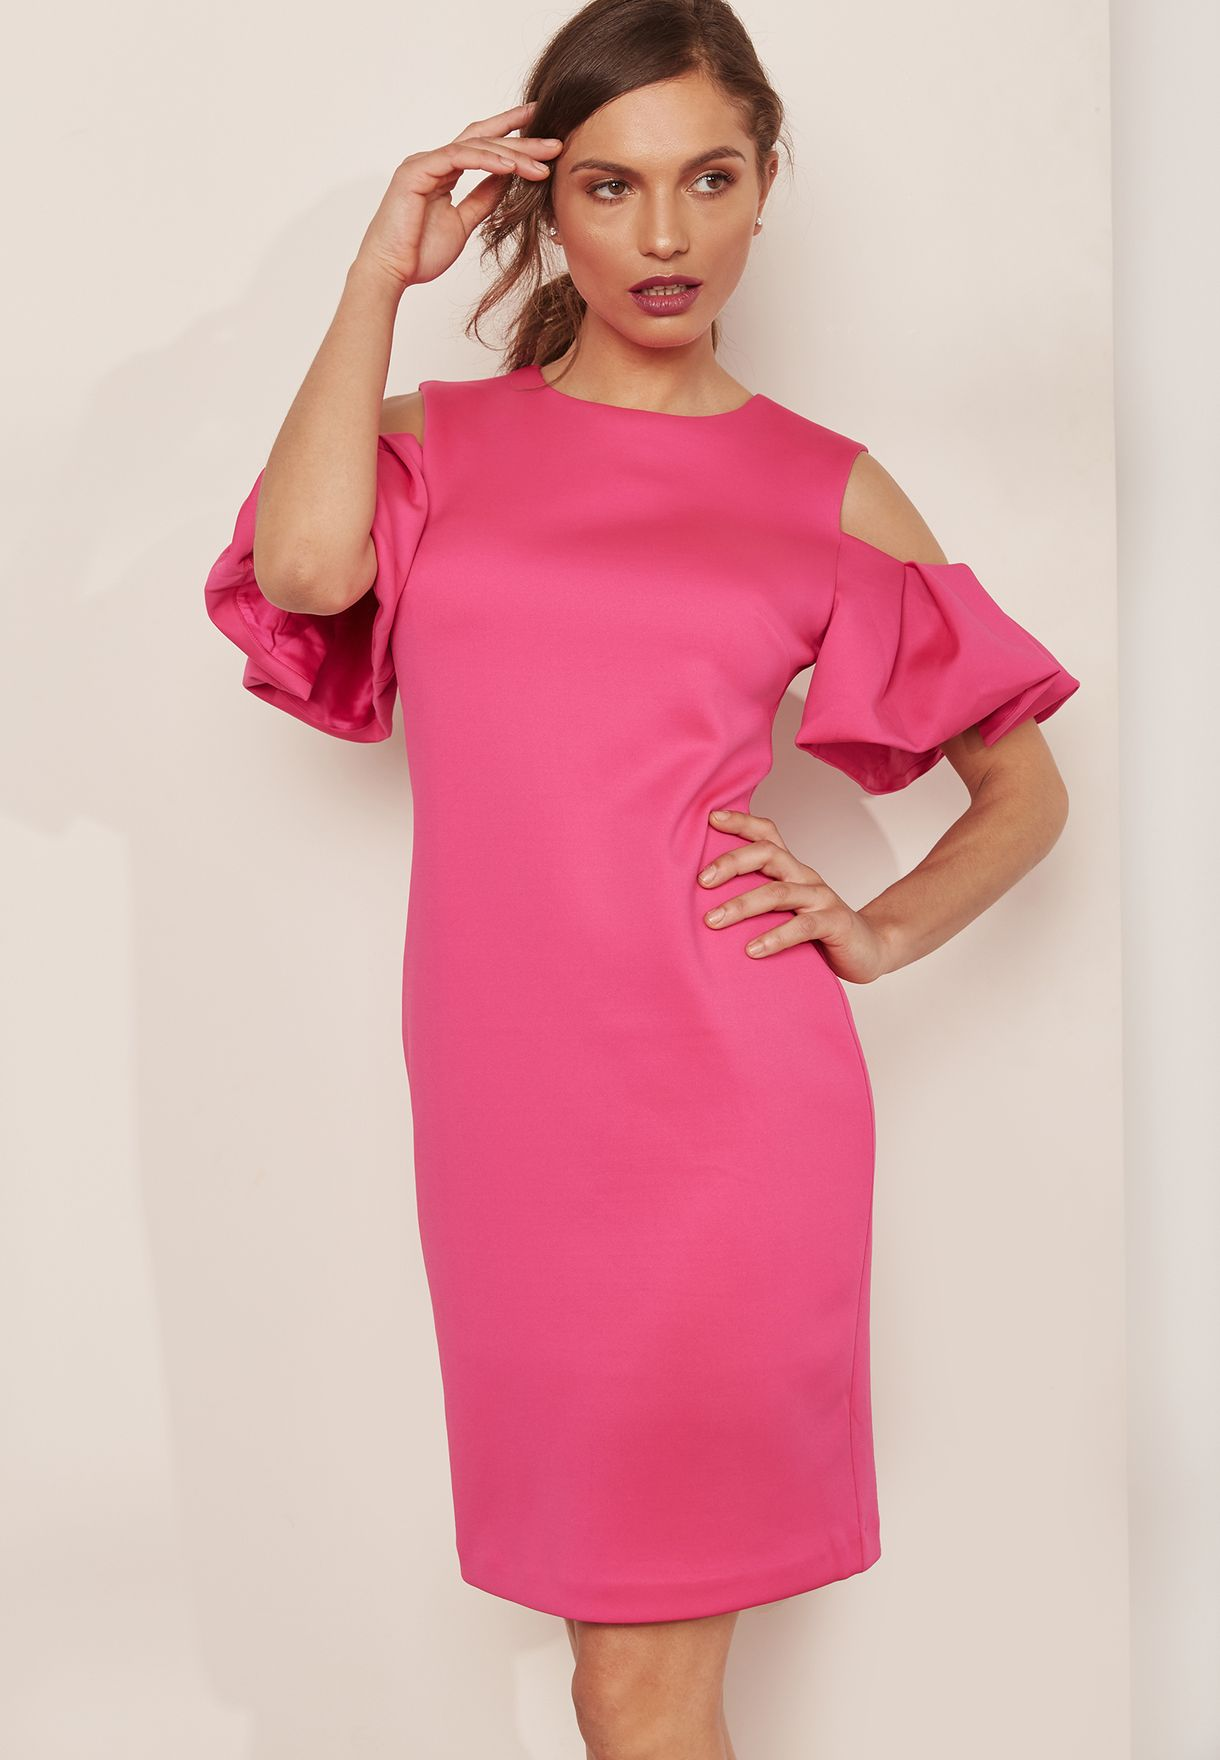 2a14a5a67ffb4 Shop Ted baker pink Flute Sleeve Cold Shoulder Dress WMD-SALNIE-WH8W ...